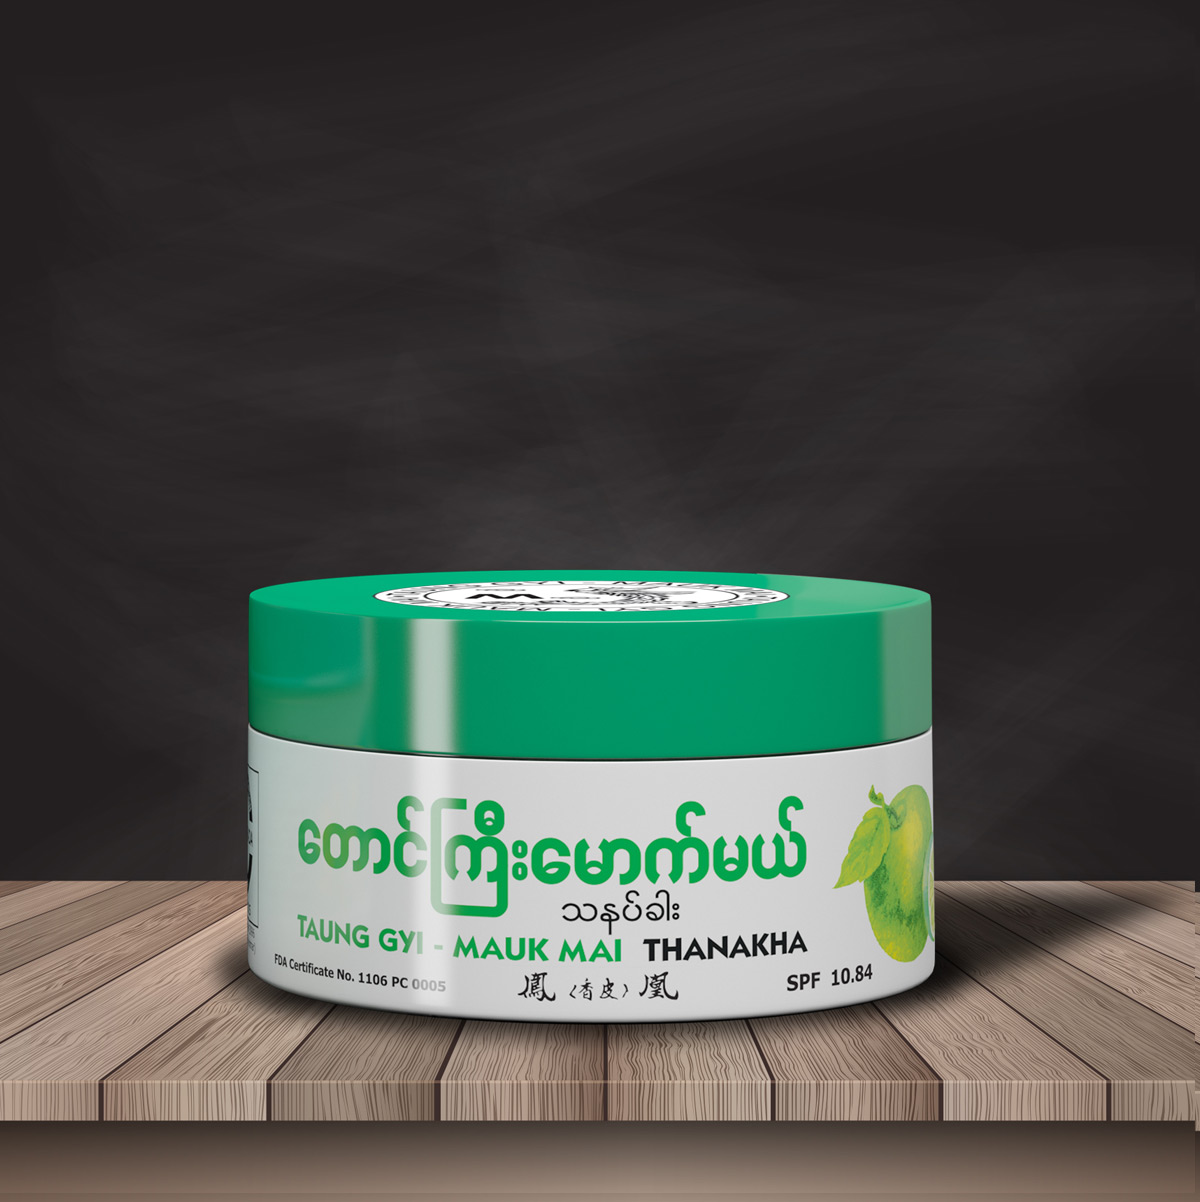 Taung Gyi Mauk Mai Lemon